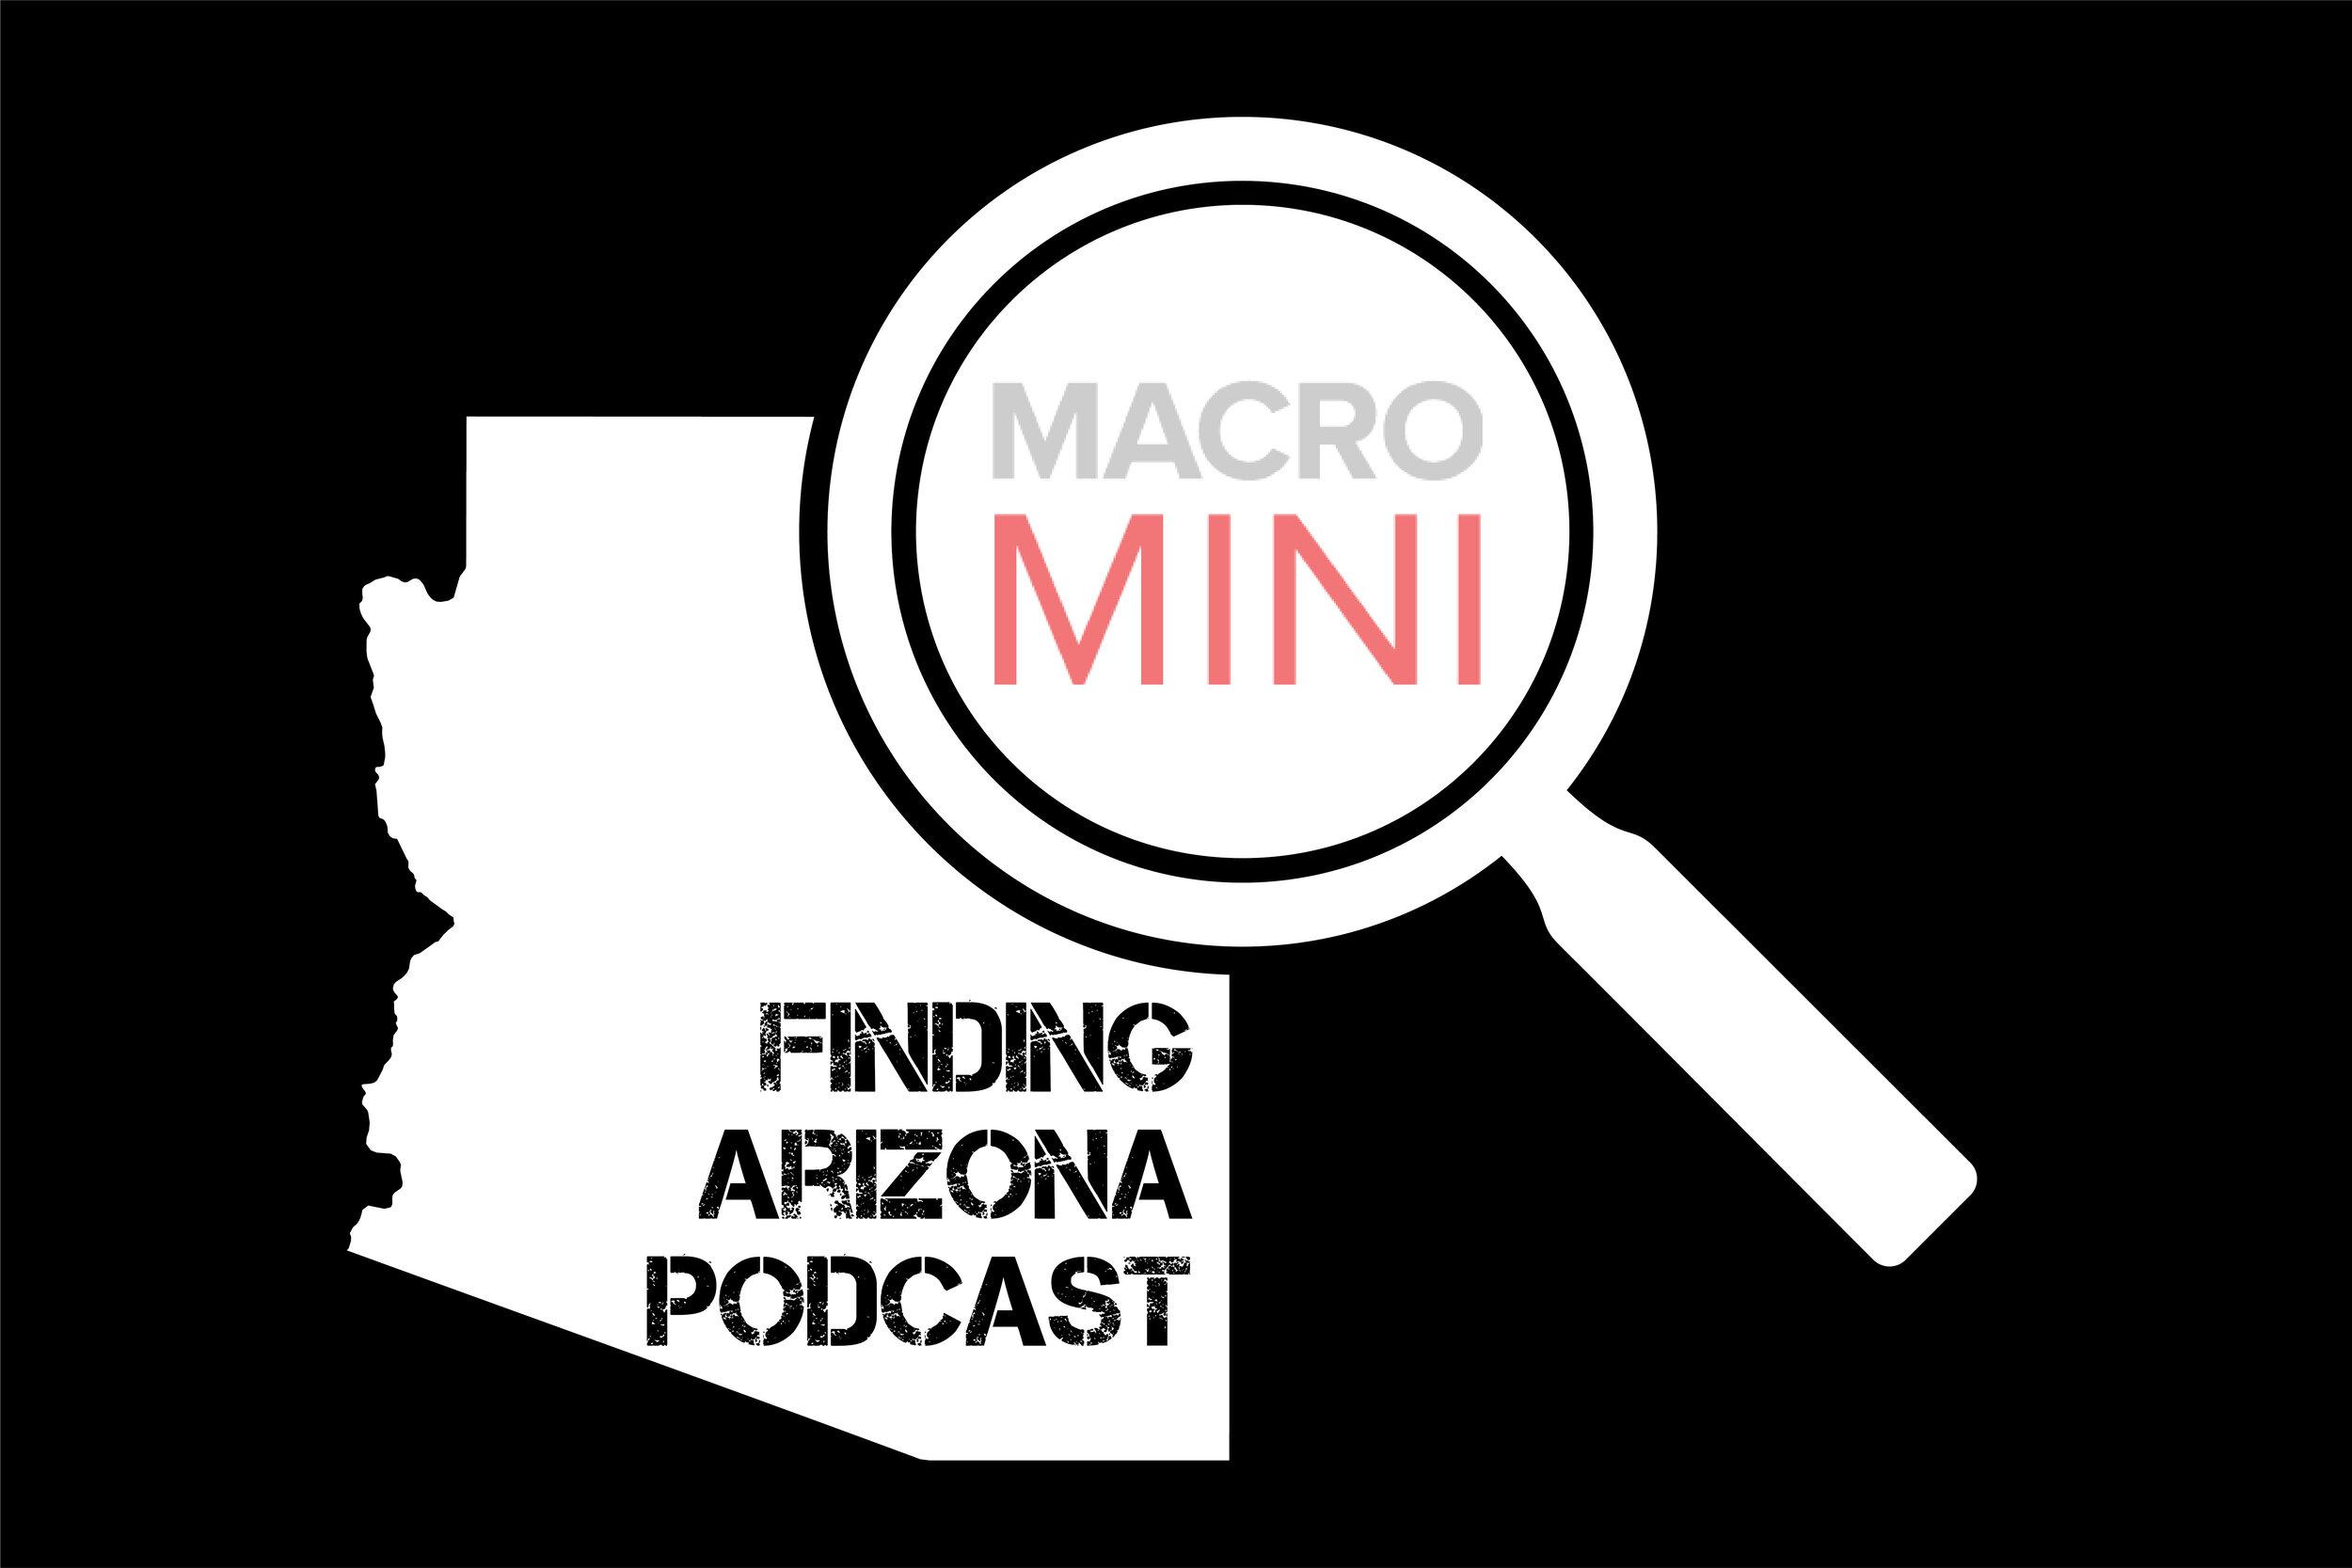 podcast-MACROMINI.jpg